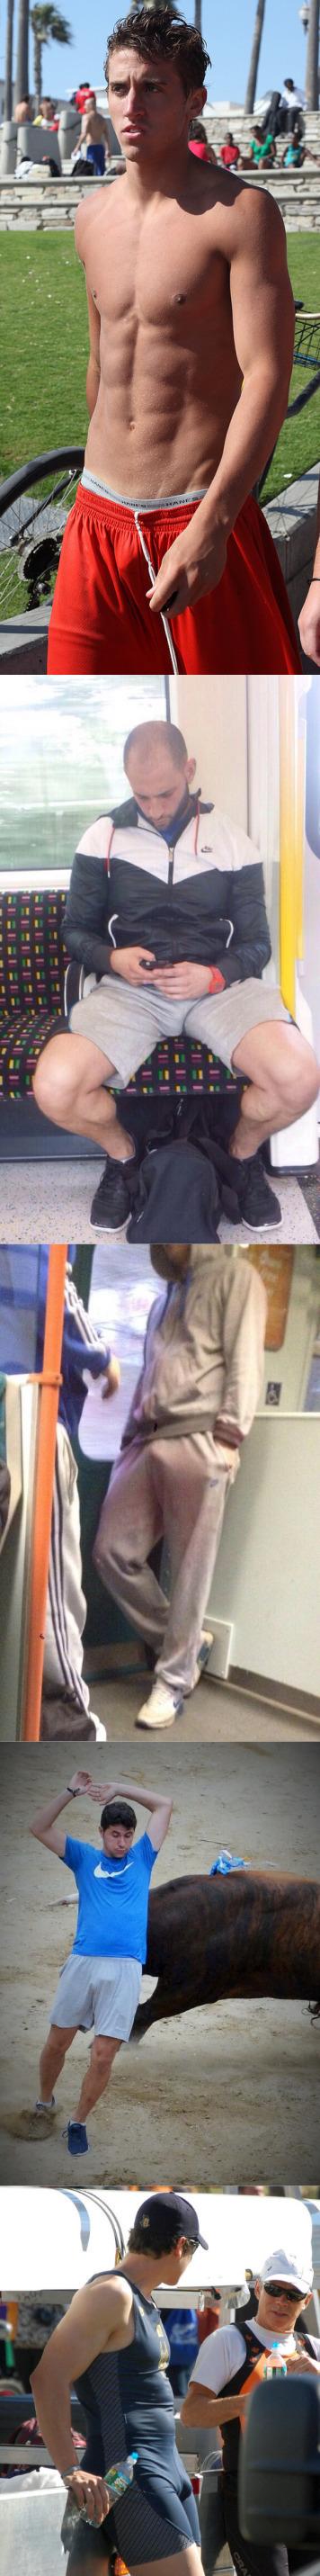 candid guys bulges public